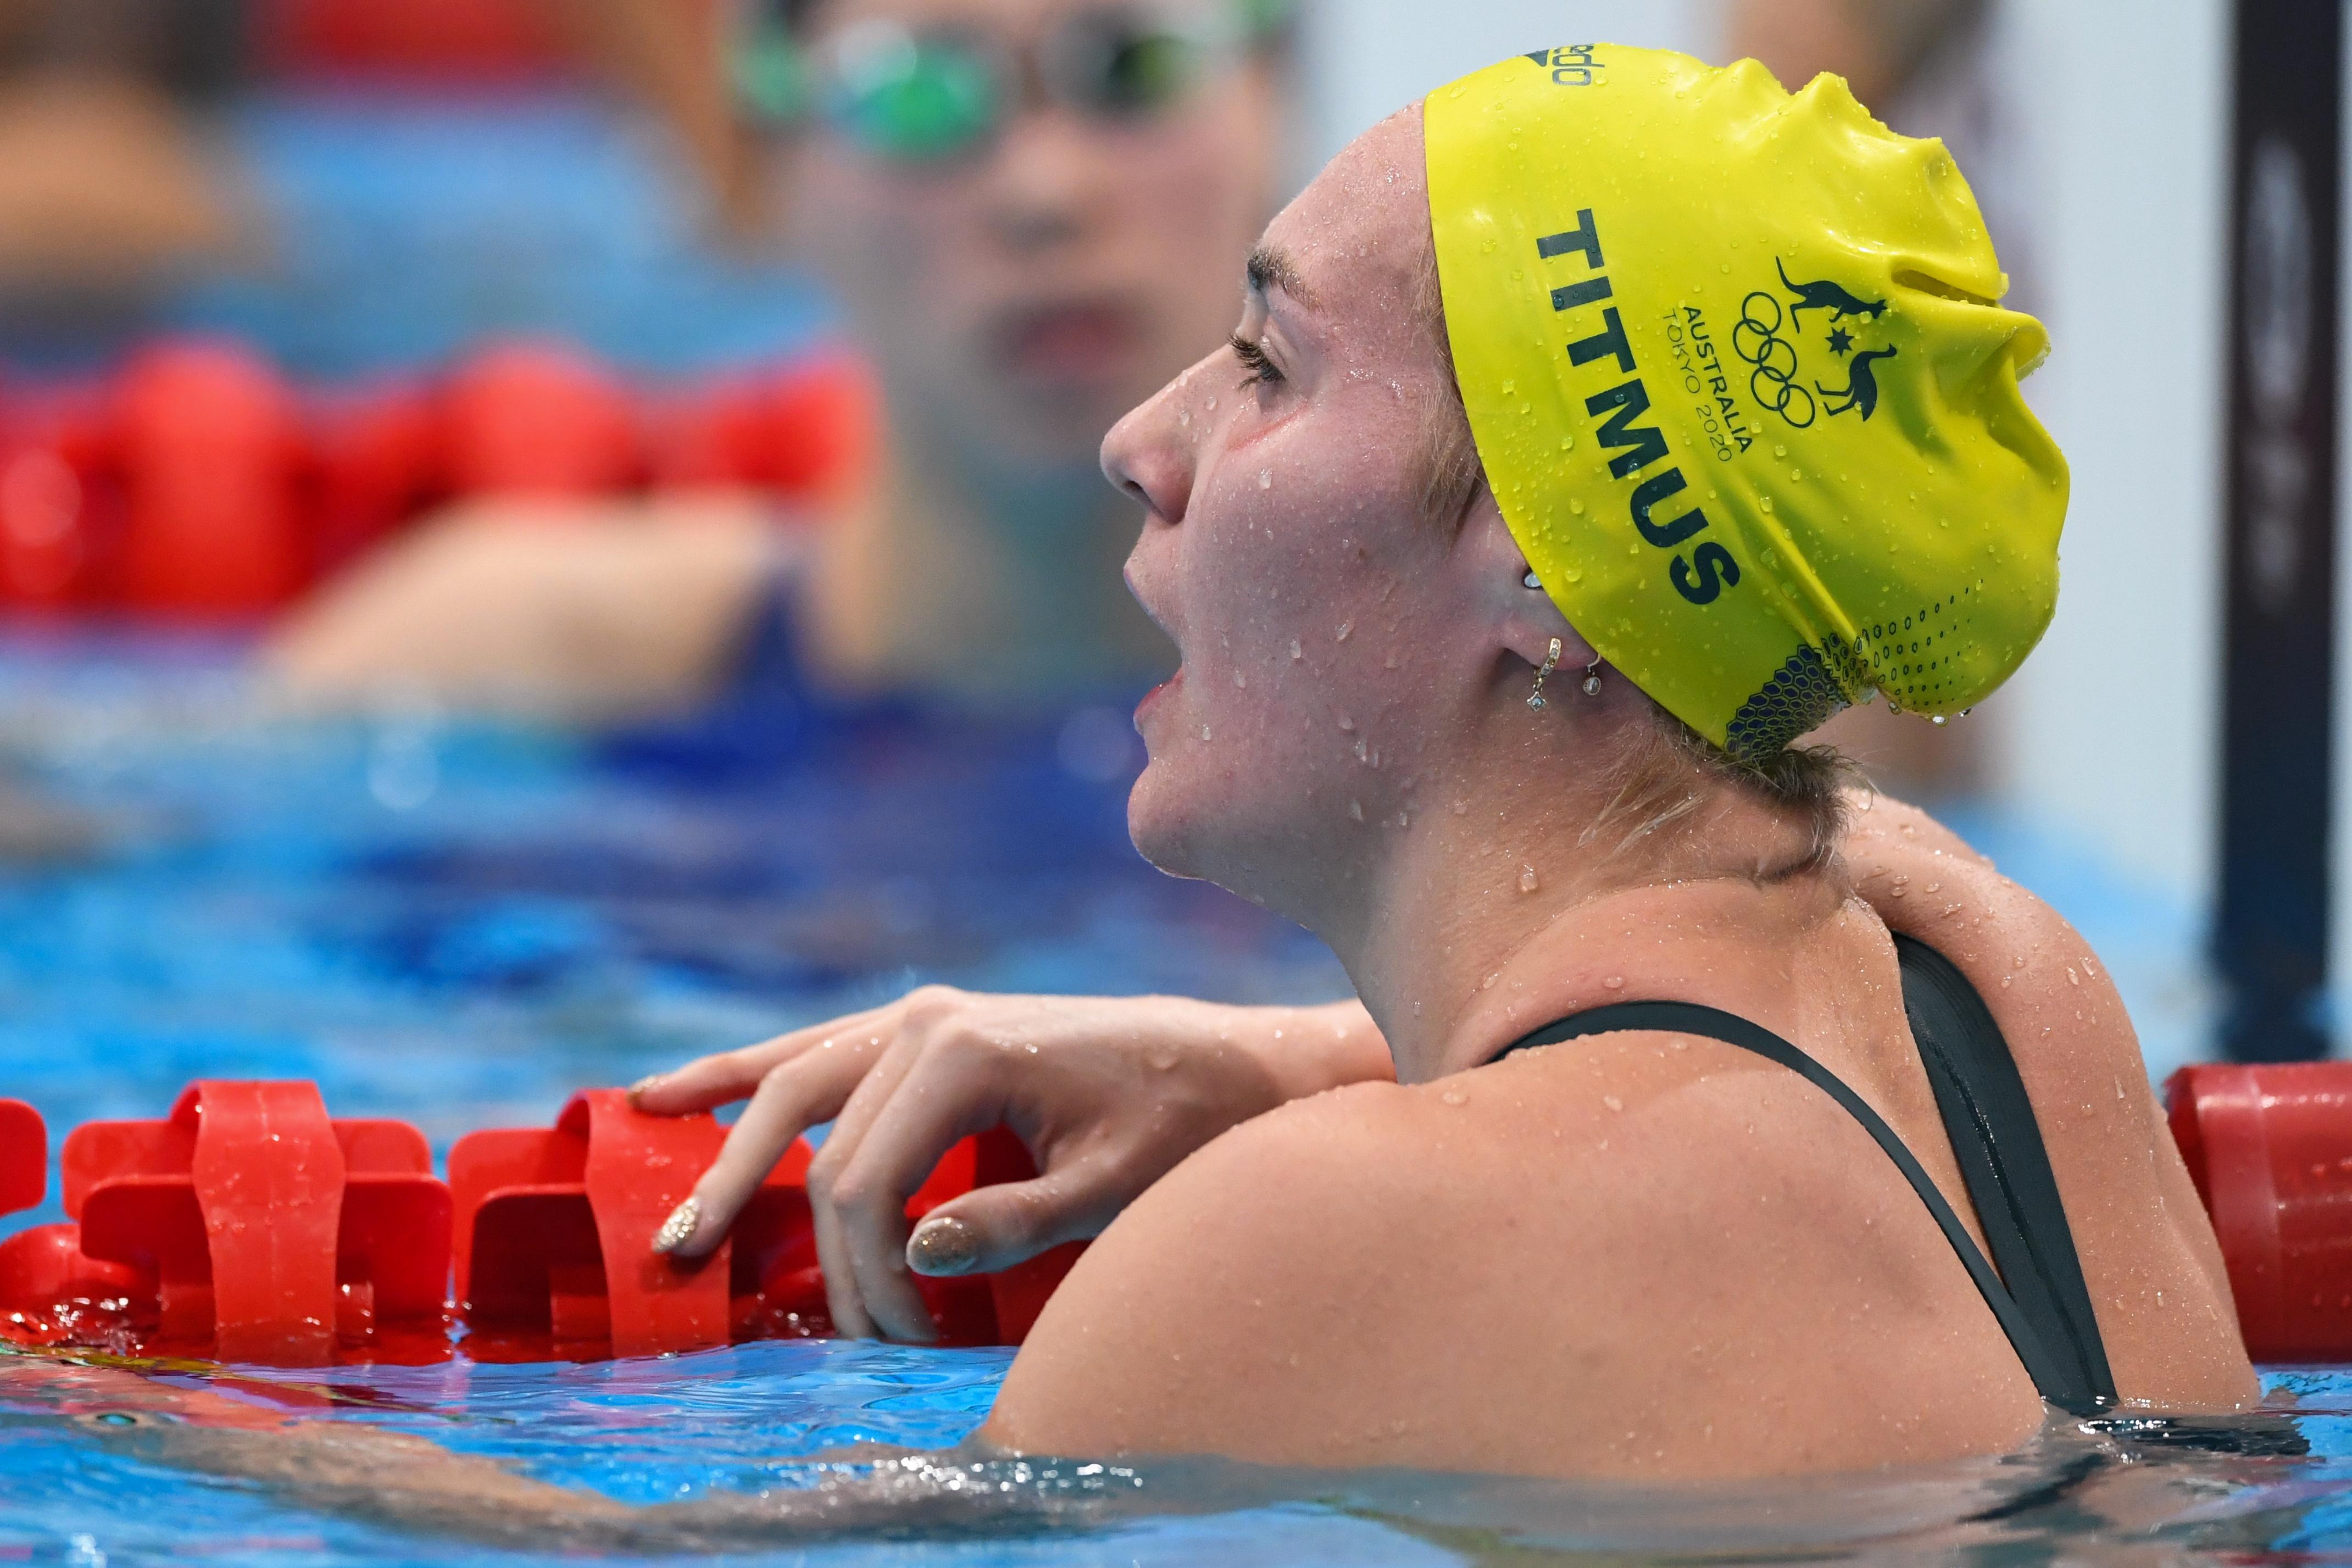 Tokyo 2020 Olympics - Swimming - Women's 800m Freestyle - Final- Tokyo Aquatics Centre - Tokyo, Japan - July 31, 2021. Ariarne Titmus of Australia reacts after winning silver REUTERS/Piroschka Van De Wouw